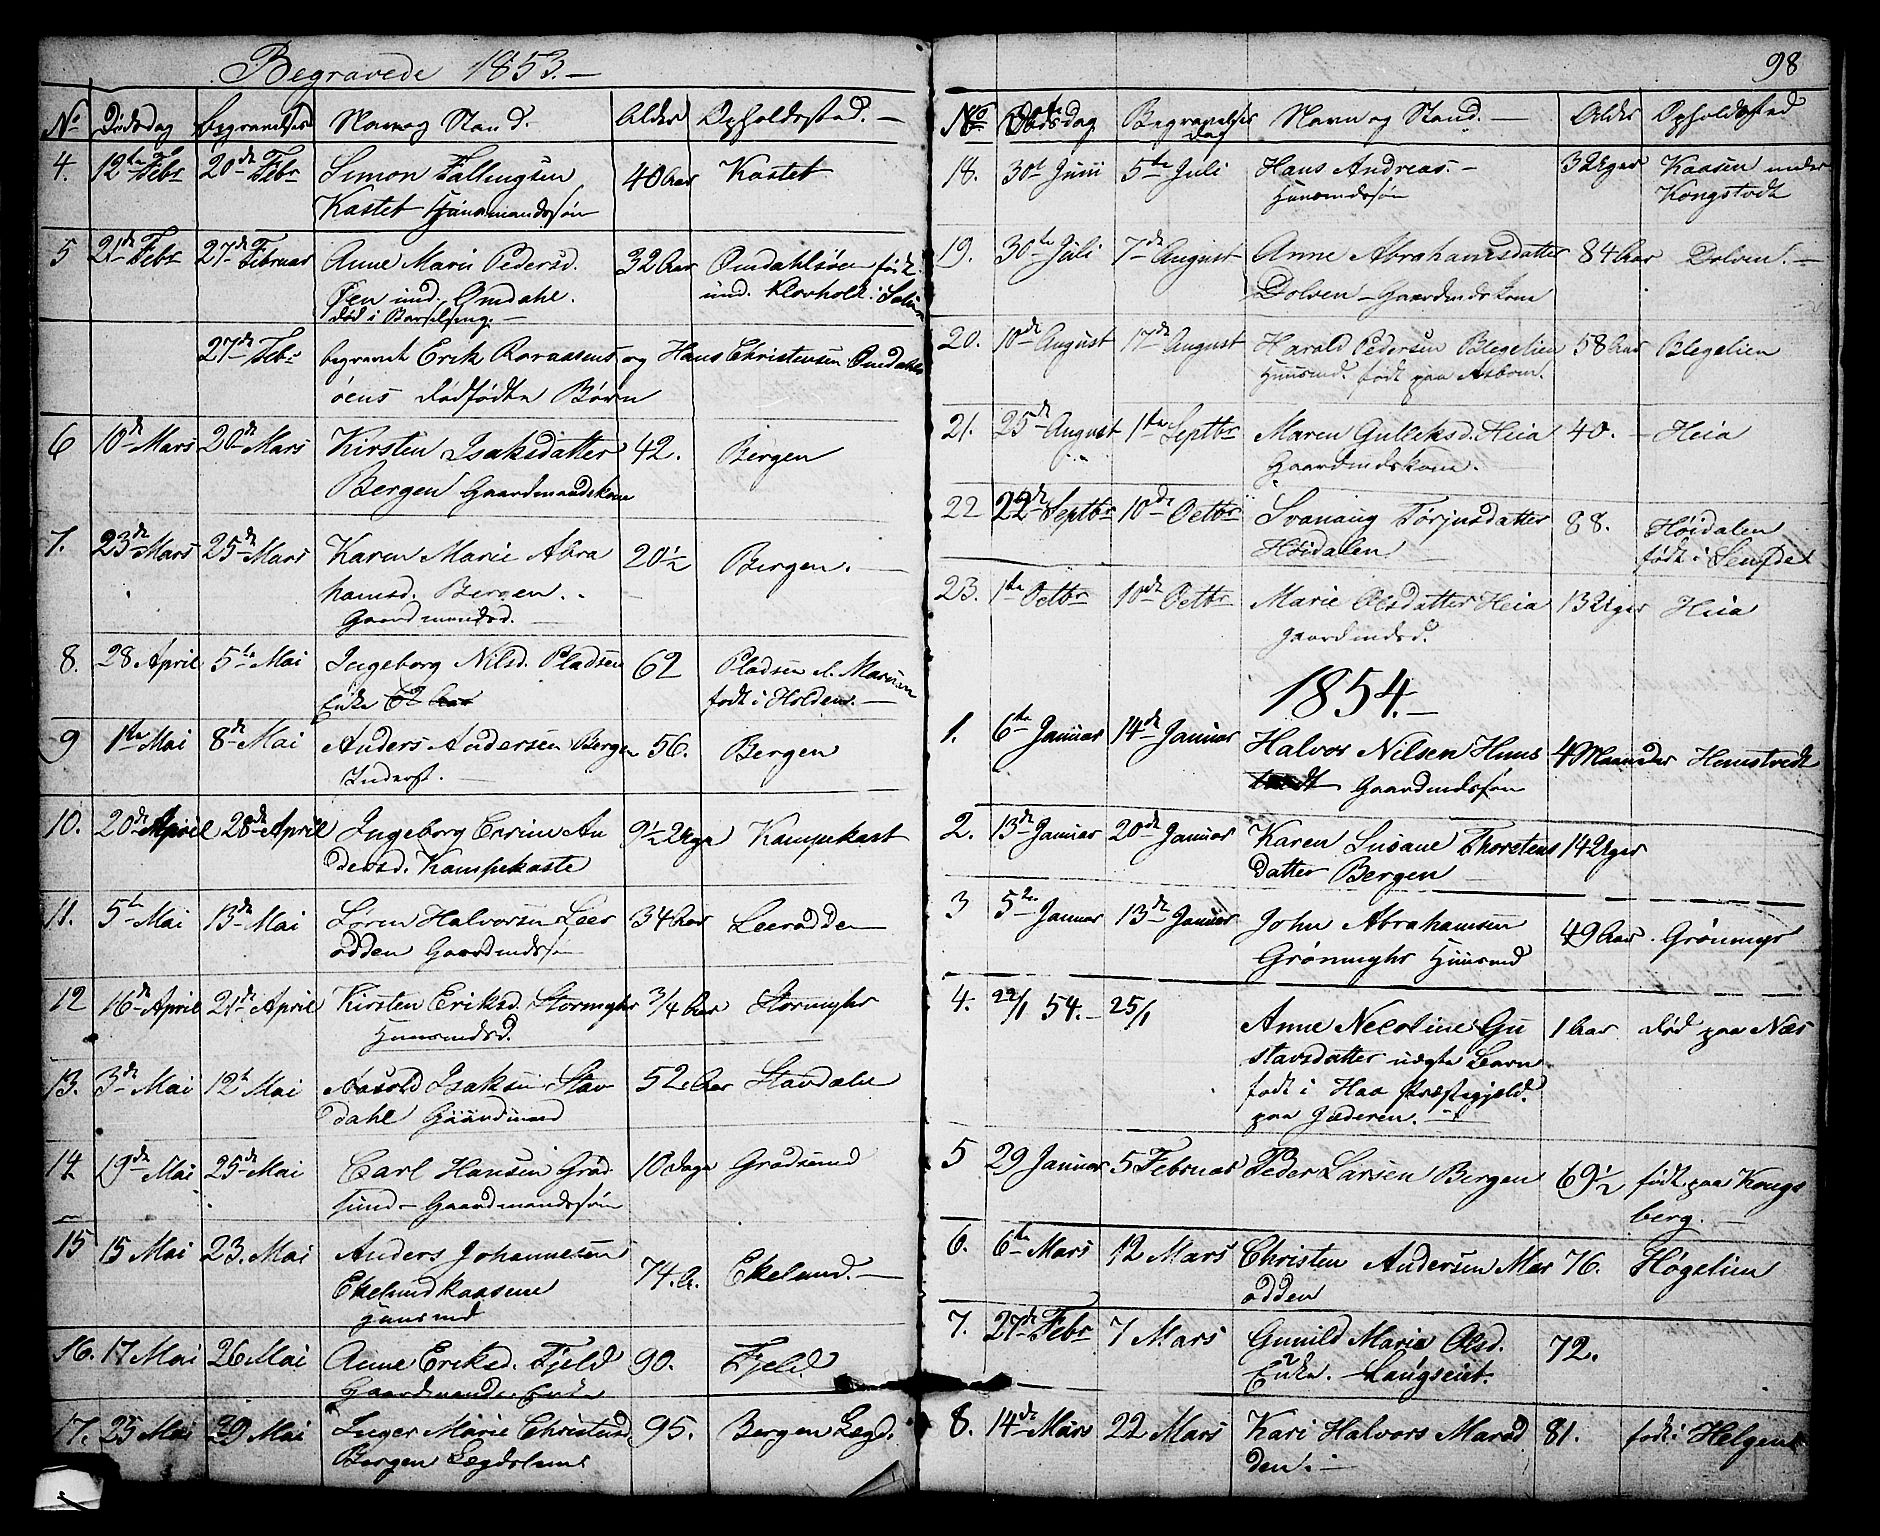 SAKO, Solum kirkebøker, G/Gb/L0001: Klokkerbok nr. II 1, 1848-1859, s. 98